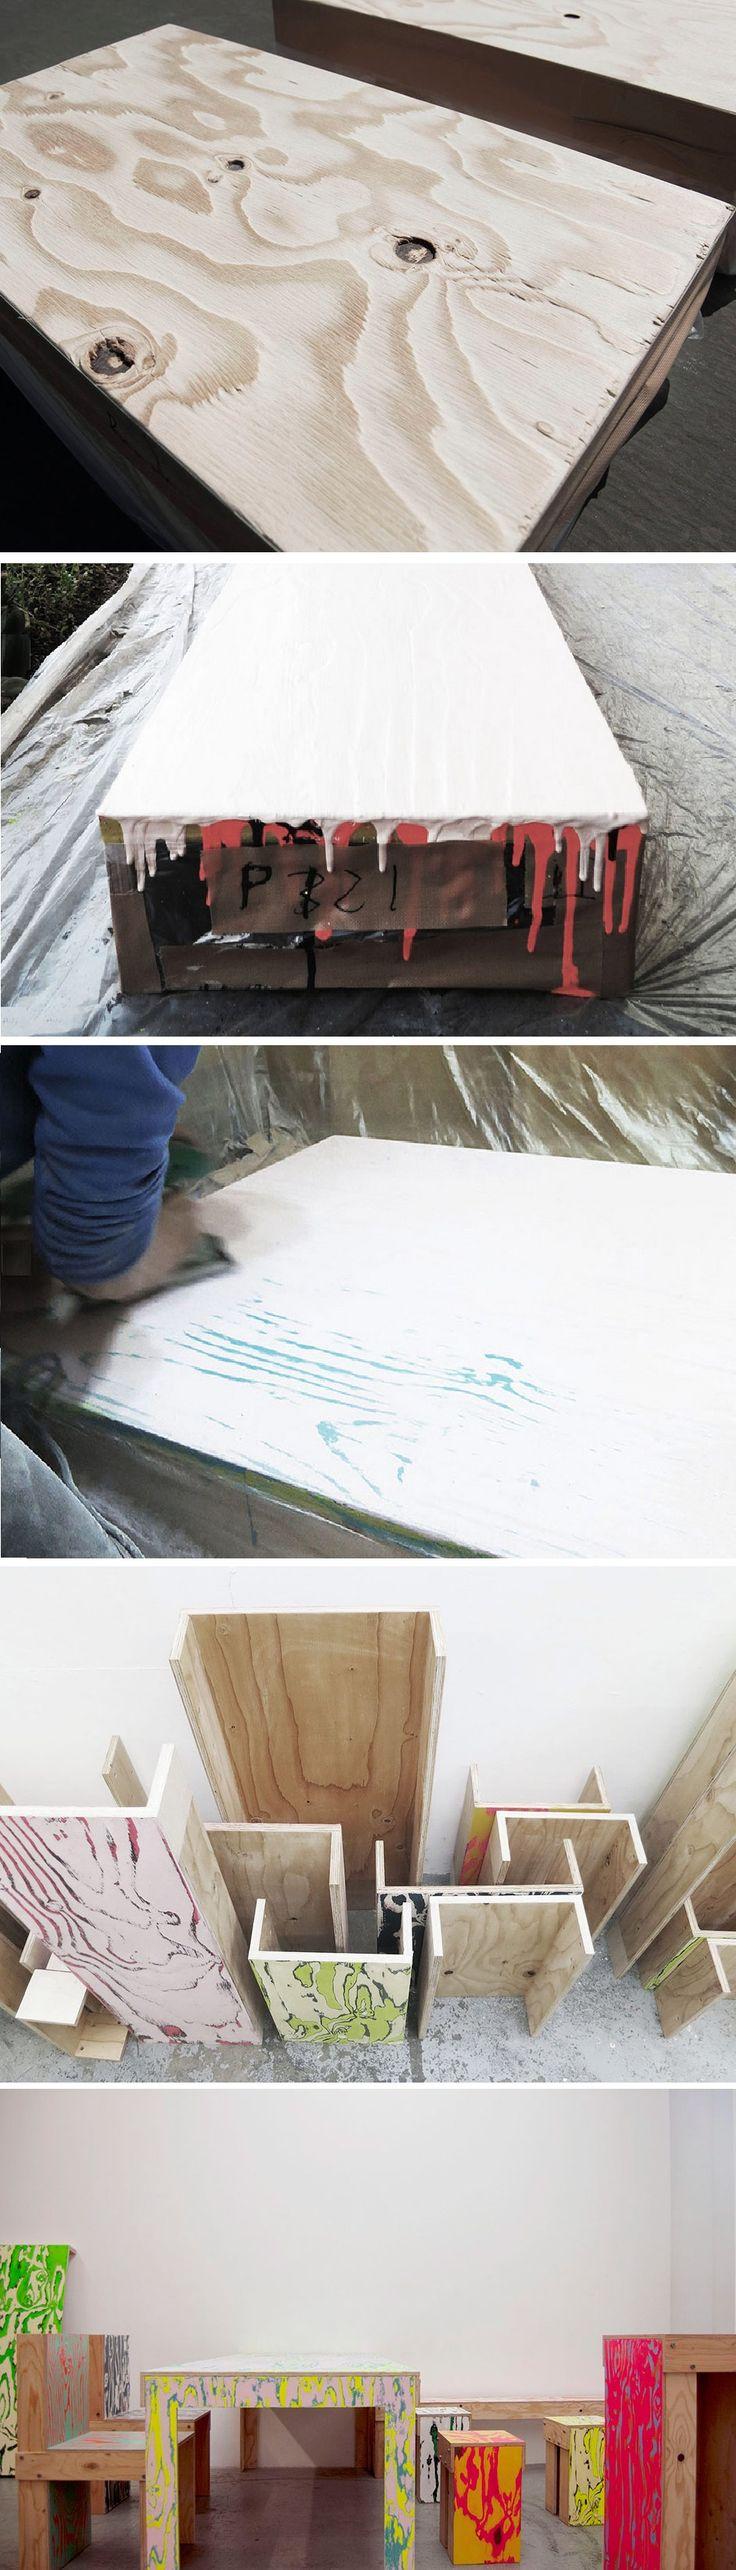 udukuri process - schemata architects / jo nagasaka: ColoRing furniture series